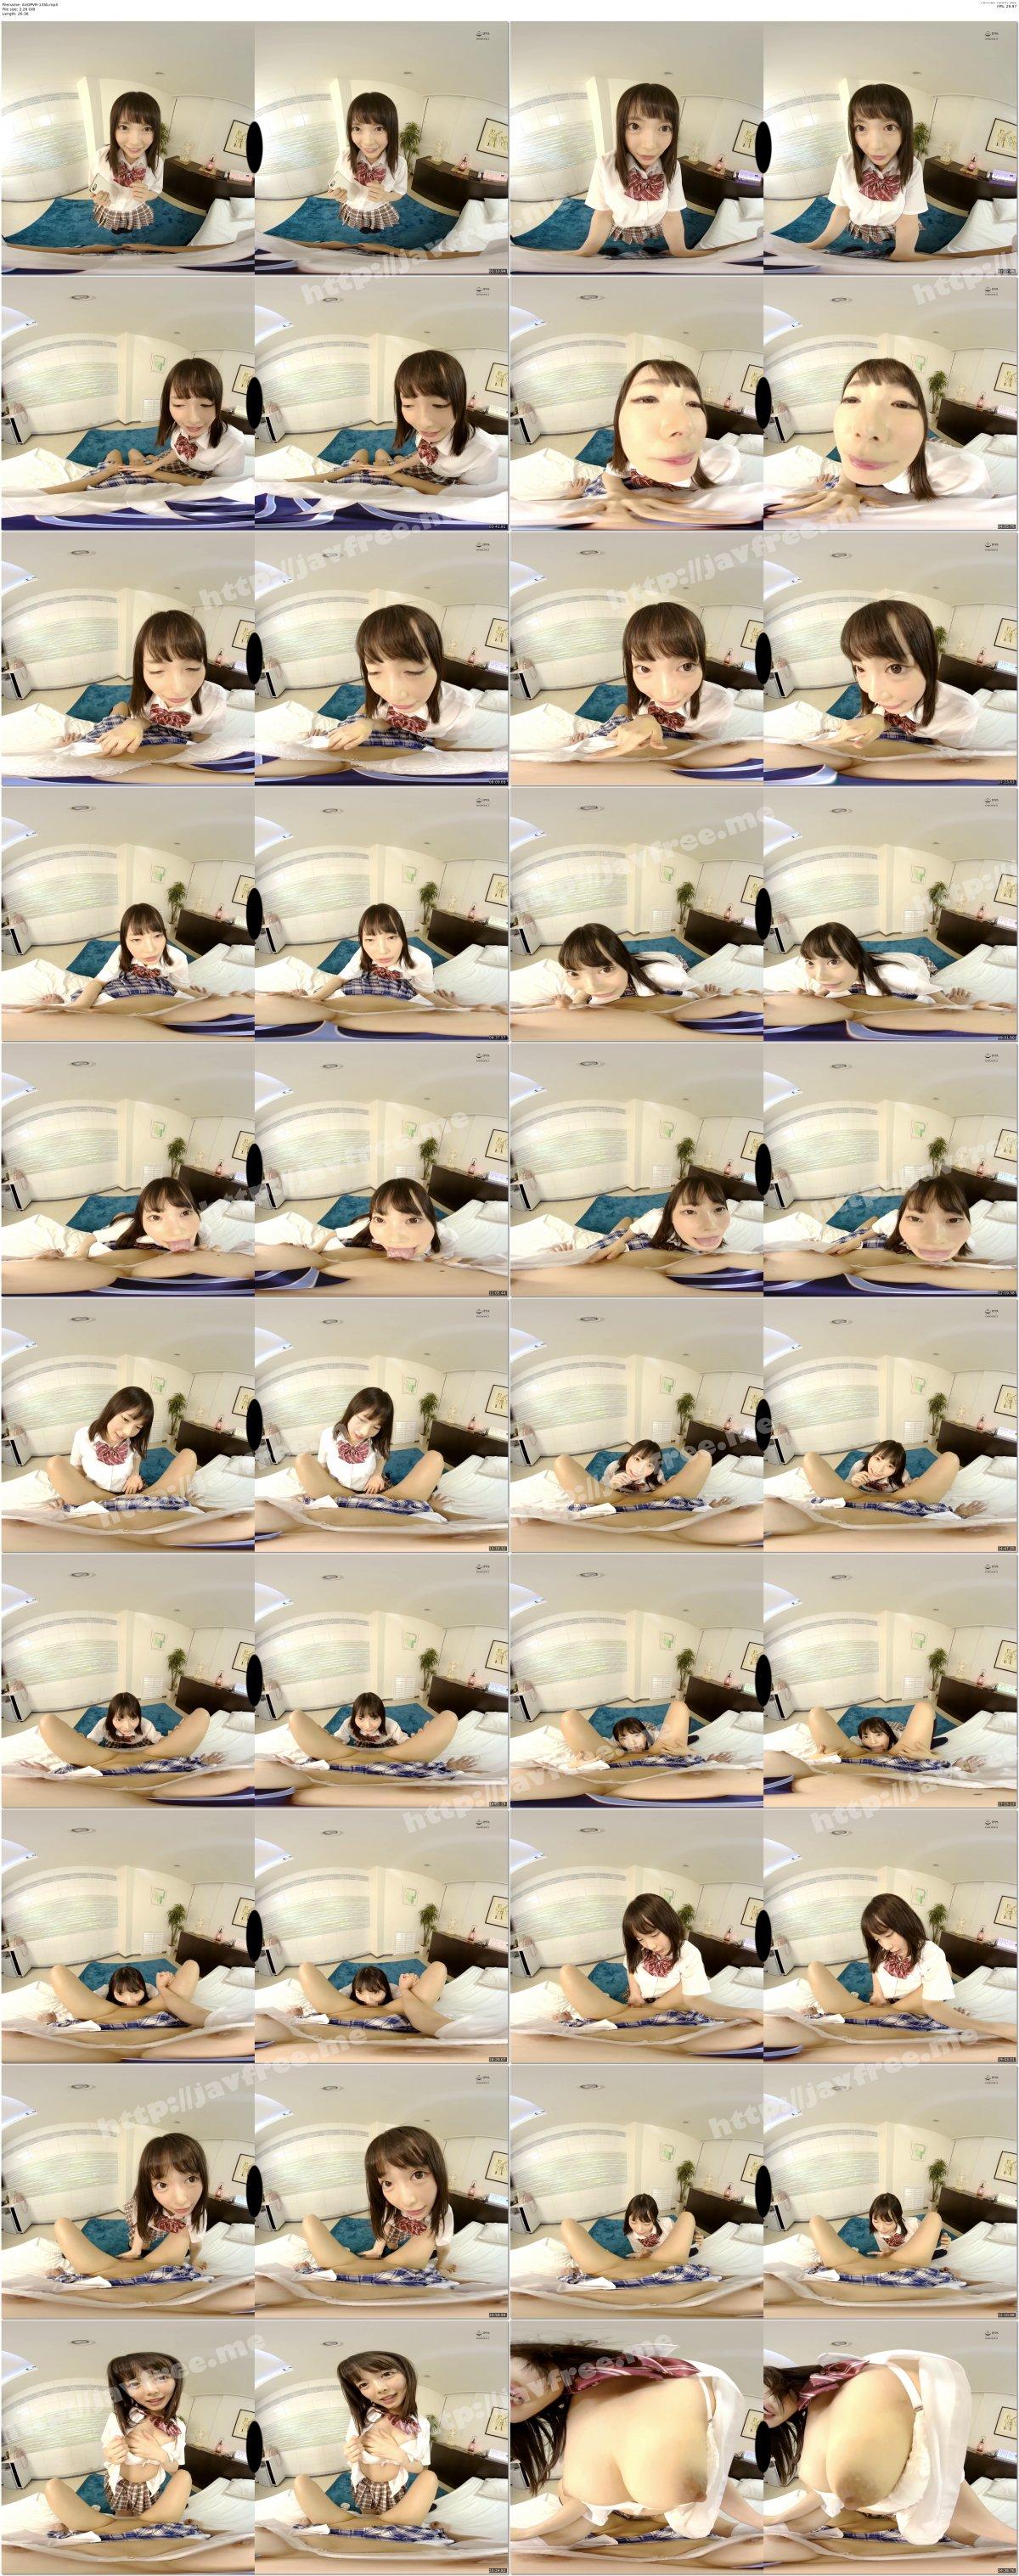 [AVOPVR-135] 【VR】レズ風俗 VR【視点移動×固定視点】で女の子になって、レズ風俗で責められまくって女子のイクを体感できたり制服プレイを楽しめる超高画質 VR - image AVOPVR-135b on https://javfree.me